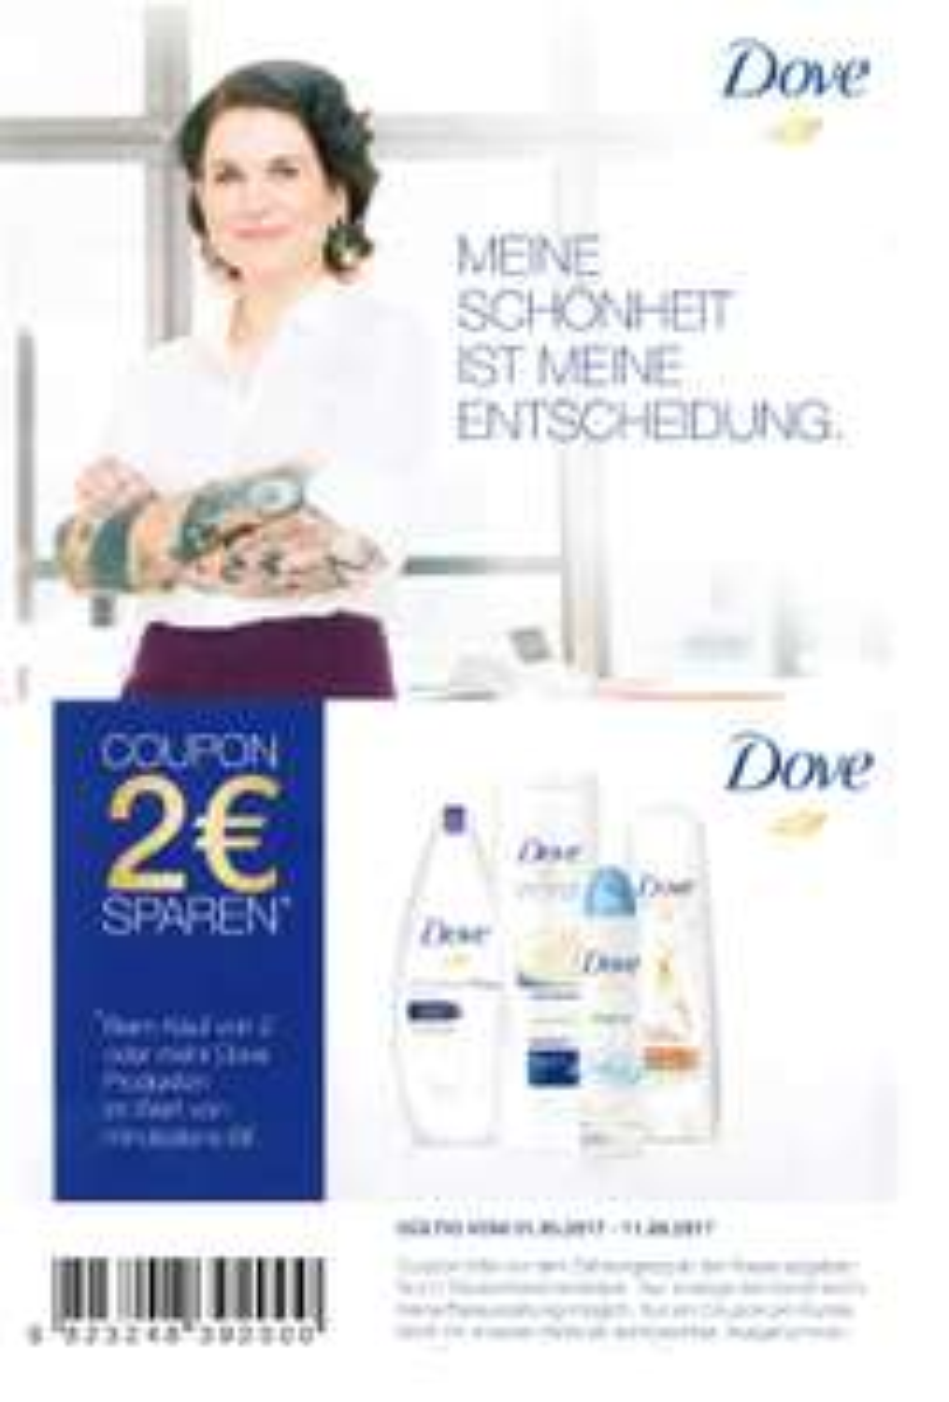 Neuer Dove -2,00€ ab 6,00€ Sofort-Rabatt-Coupon [Bundesweit]